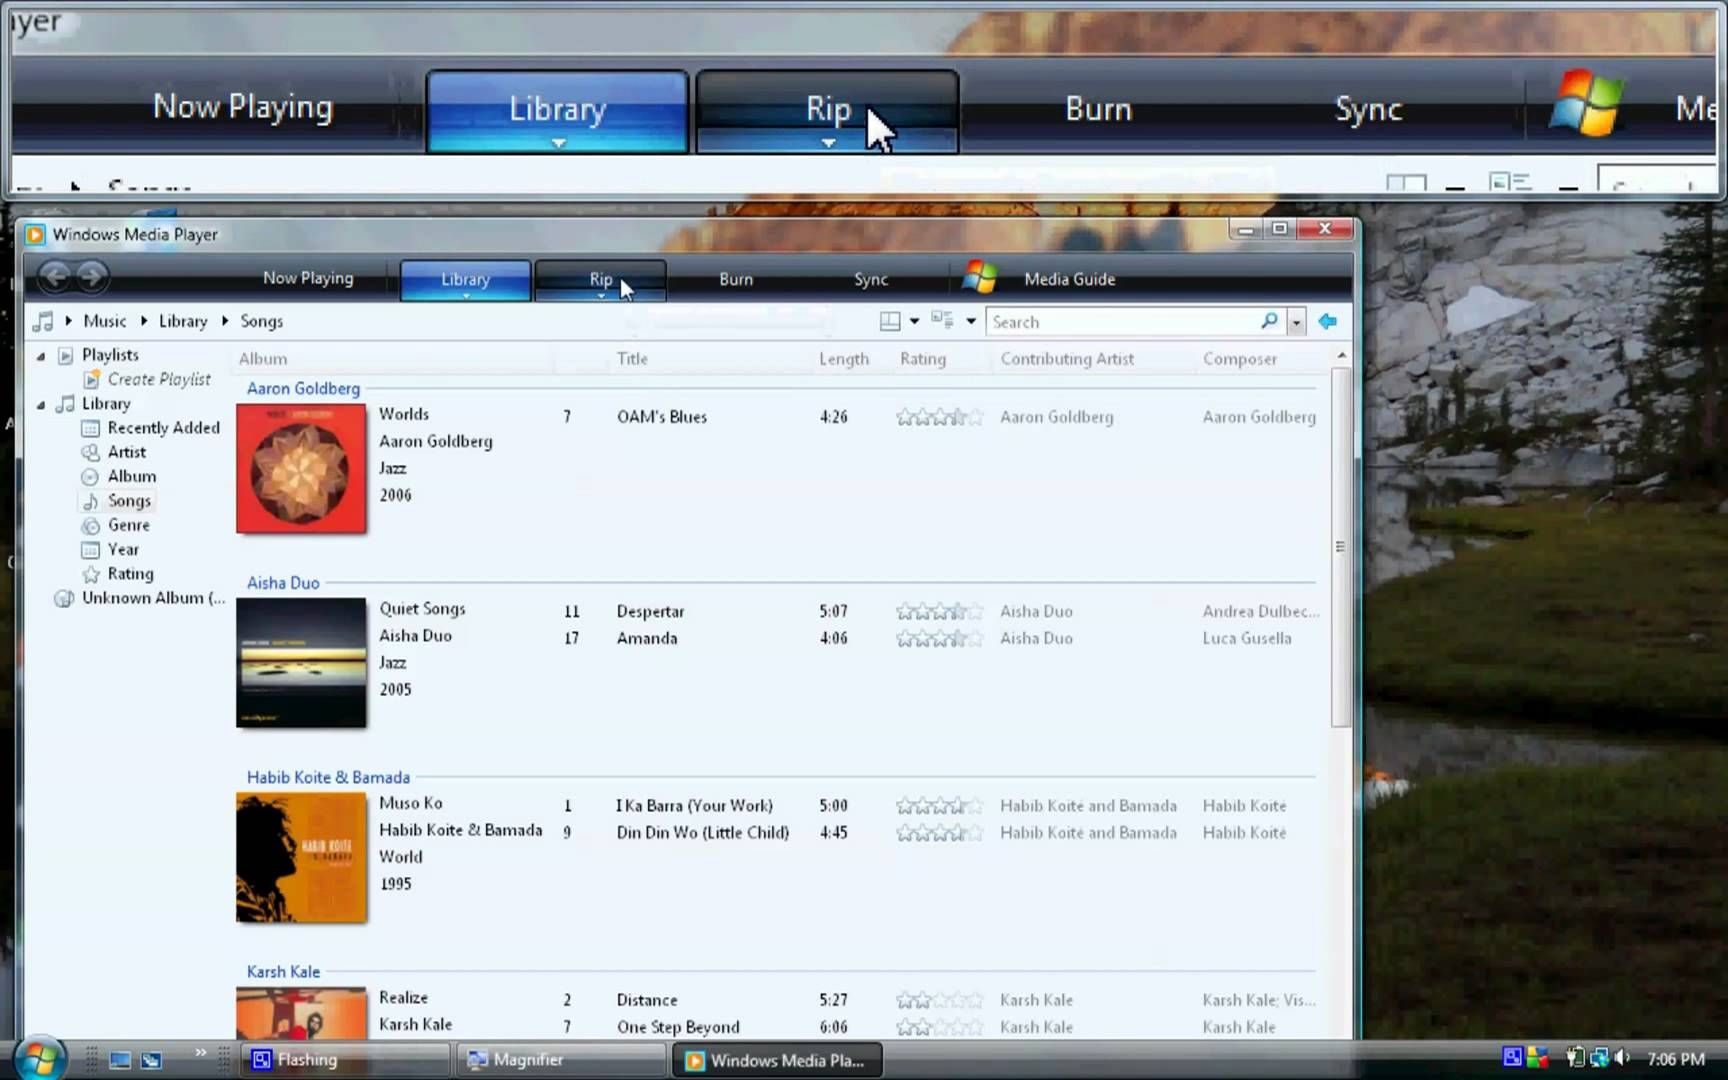 How to download itunes on windows vista 32 bit